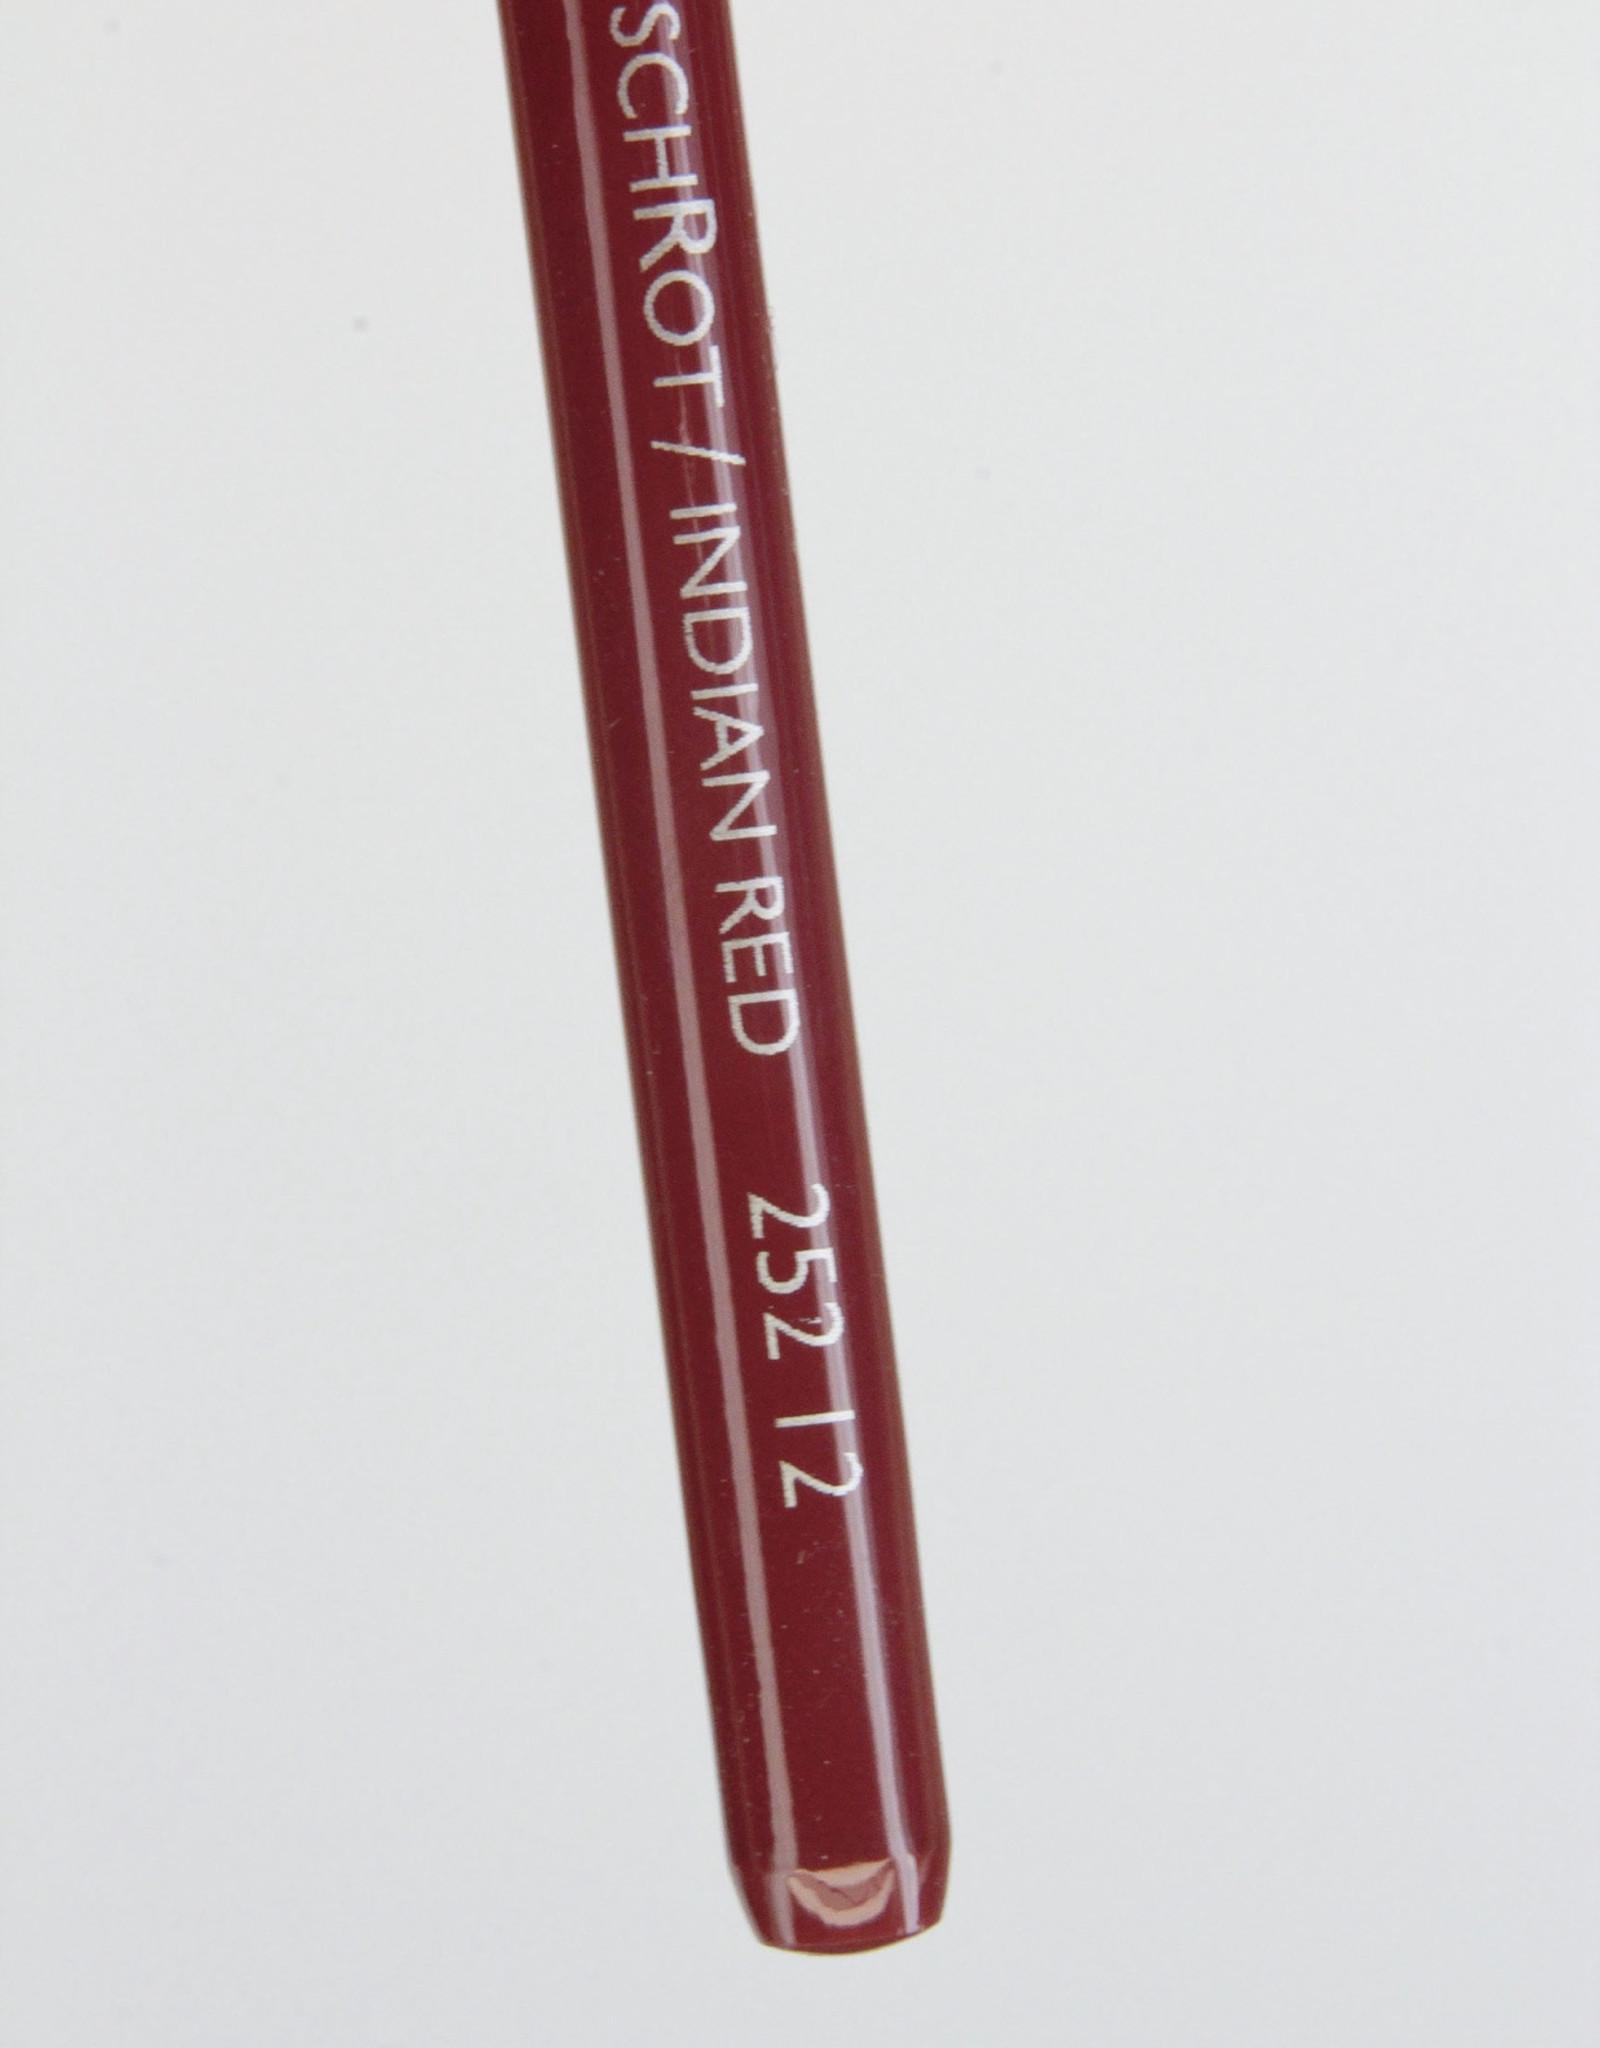 Cretacolor, Aqua Monolith Pencil, Indian Red